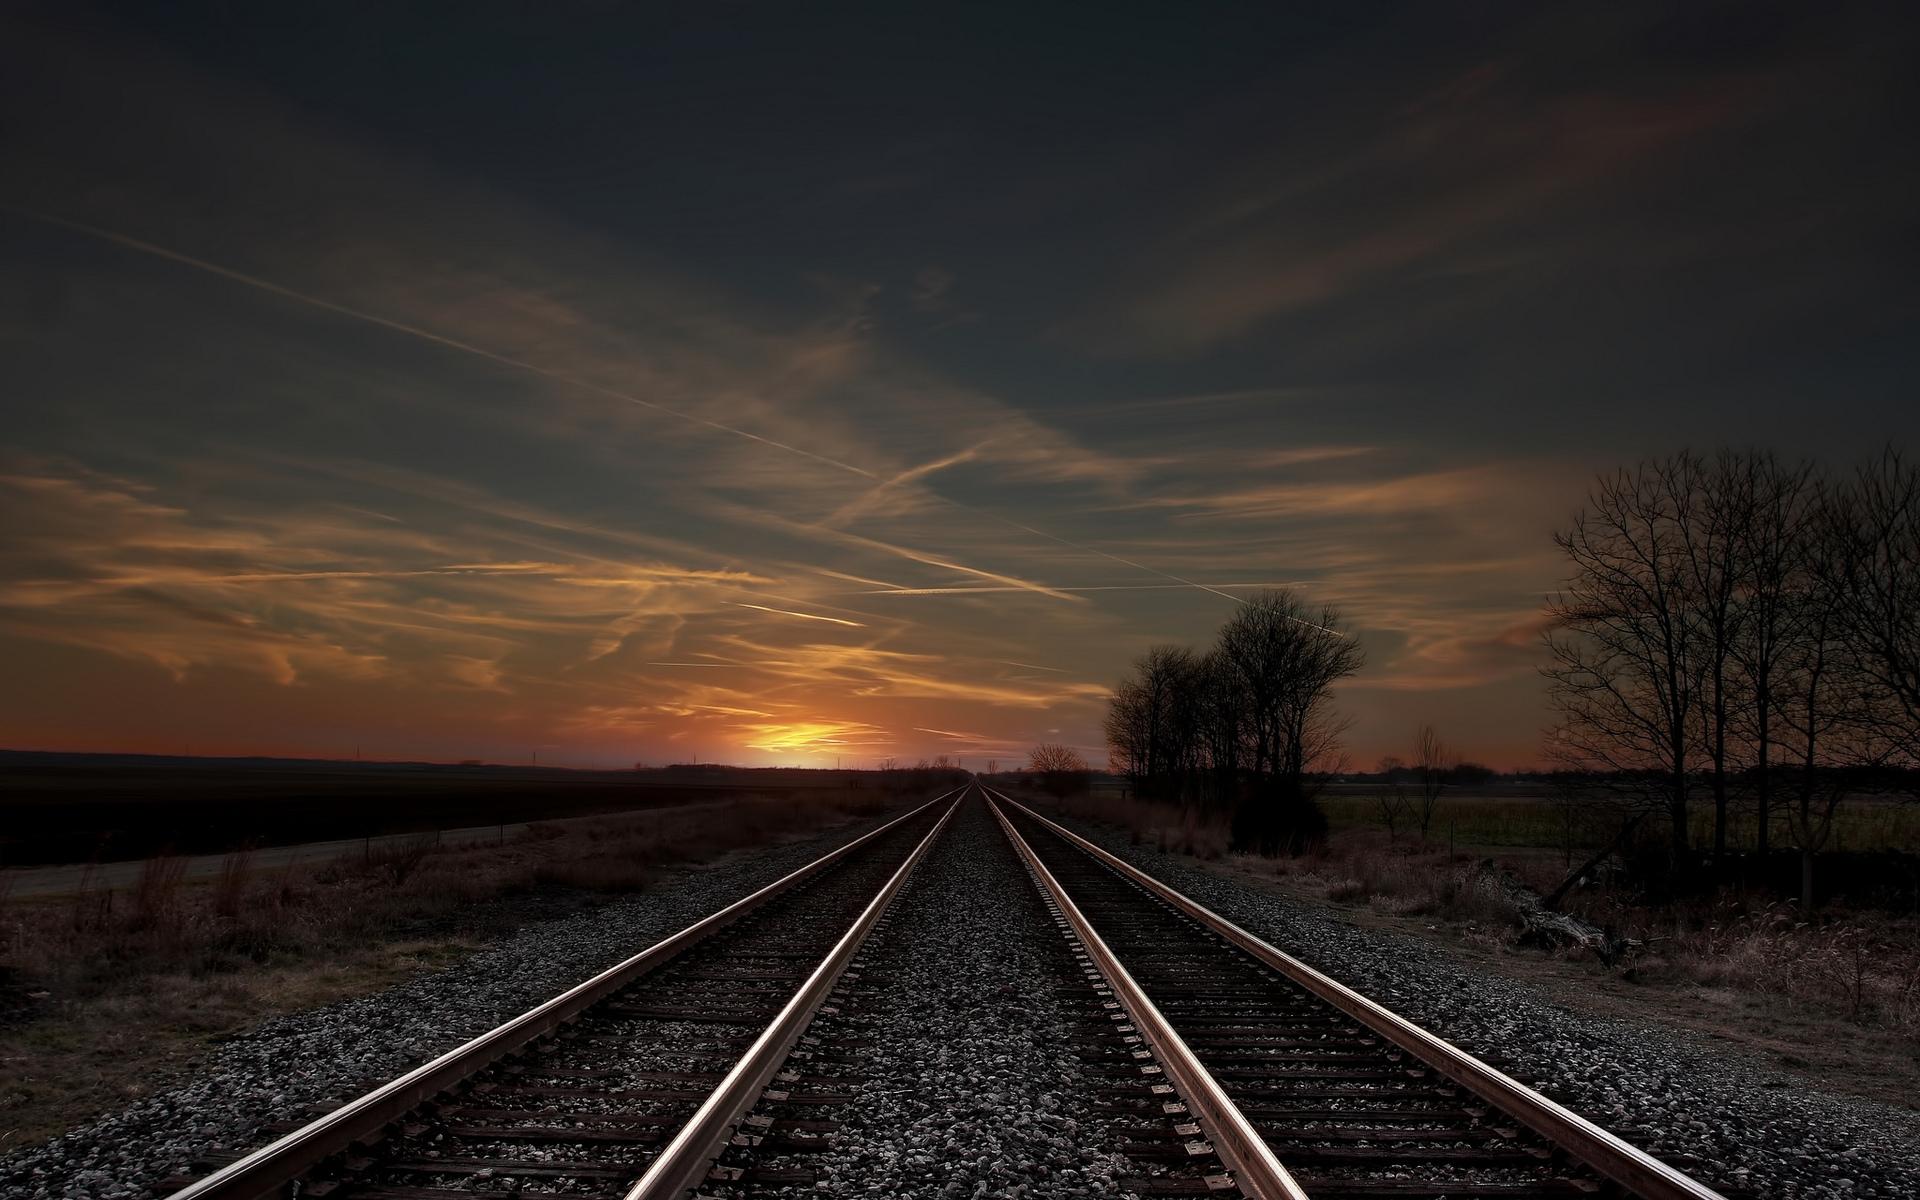 Track Field Sunset Evening Trees Railroad Wallpaper 1920x1200 69040 WallpaperUP